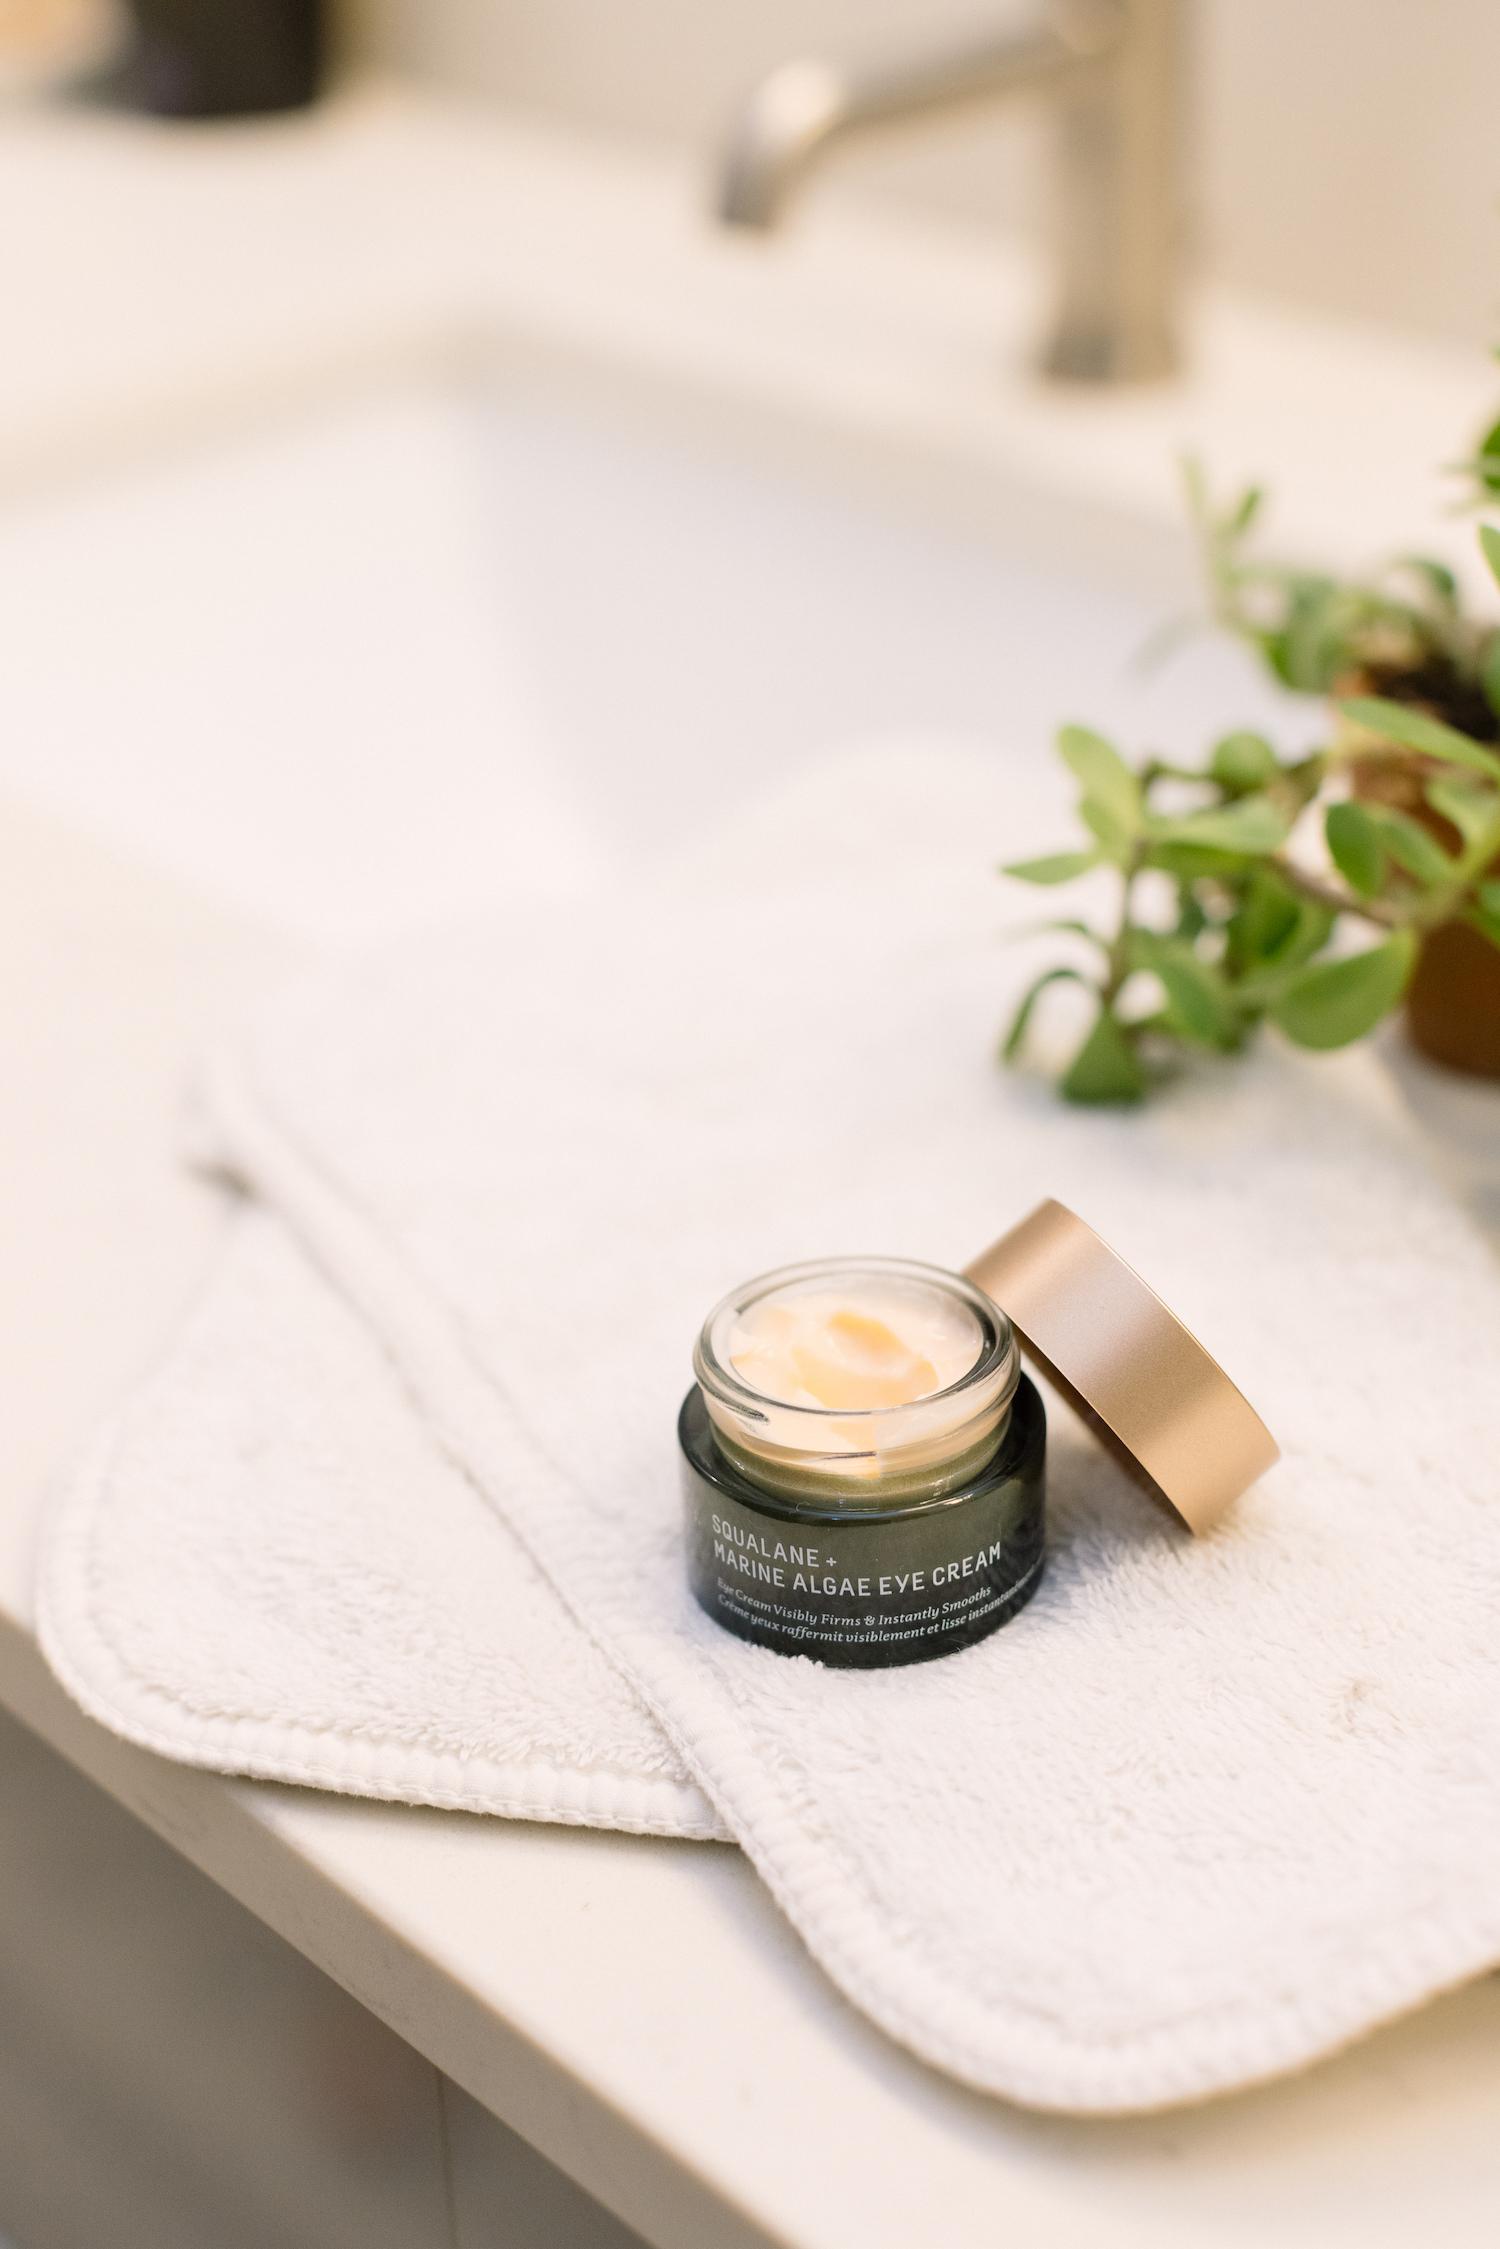 Squalane and Marine Algae Eye Cream | Biossances Friends & Family Sale